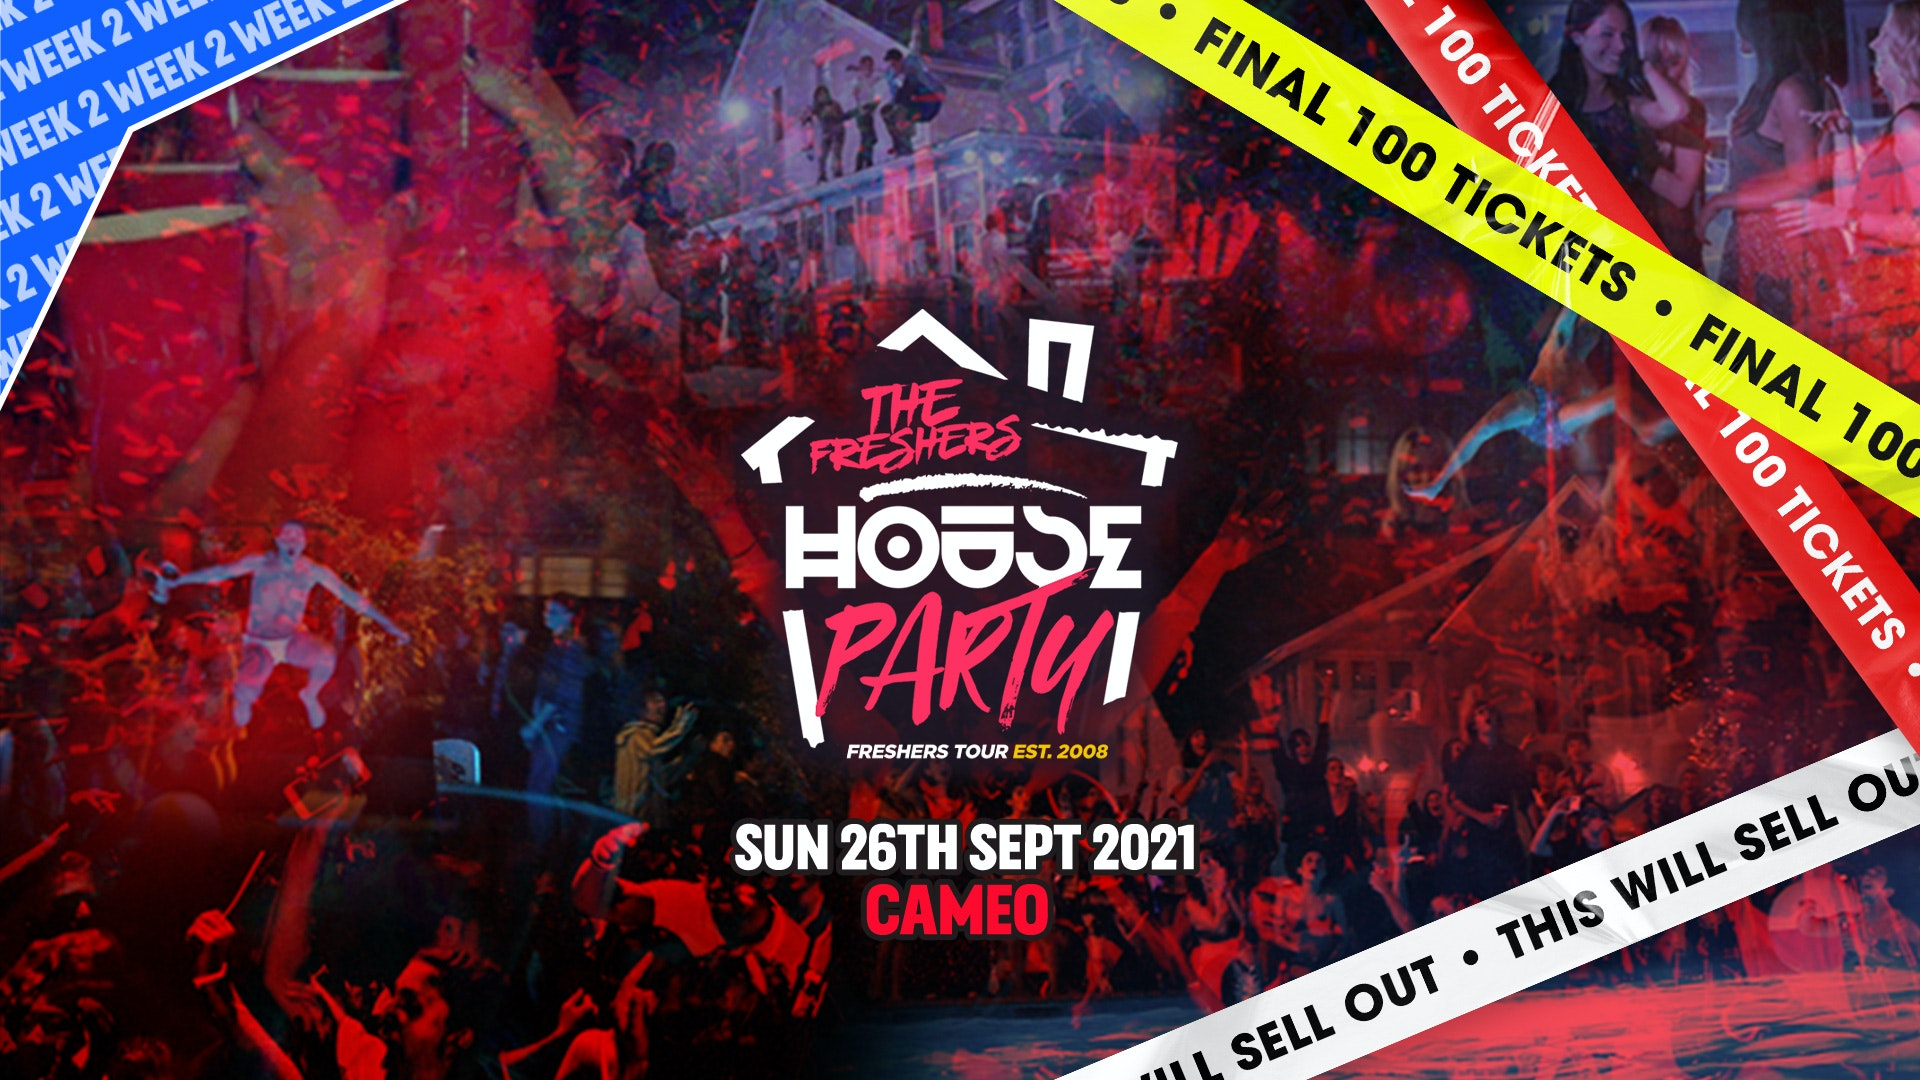 THIS SUNDAY: The Freshers House Party   Bournemouth Freshers 2021 [Week 2 Freshers Event]